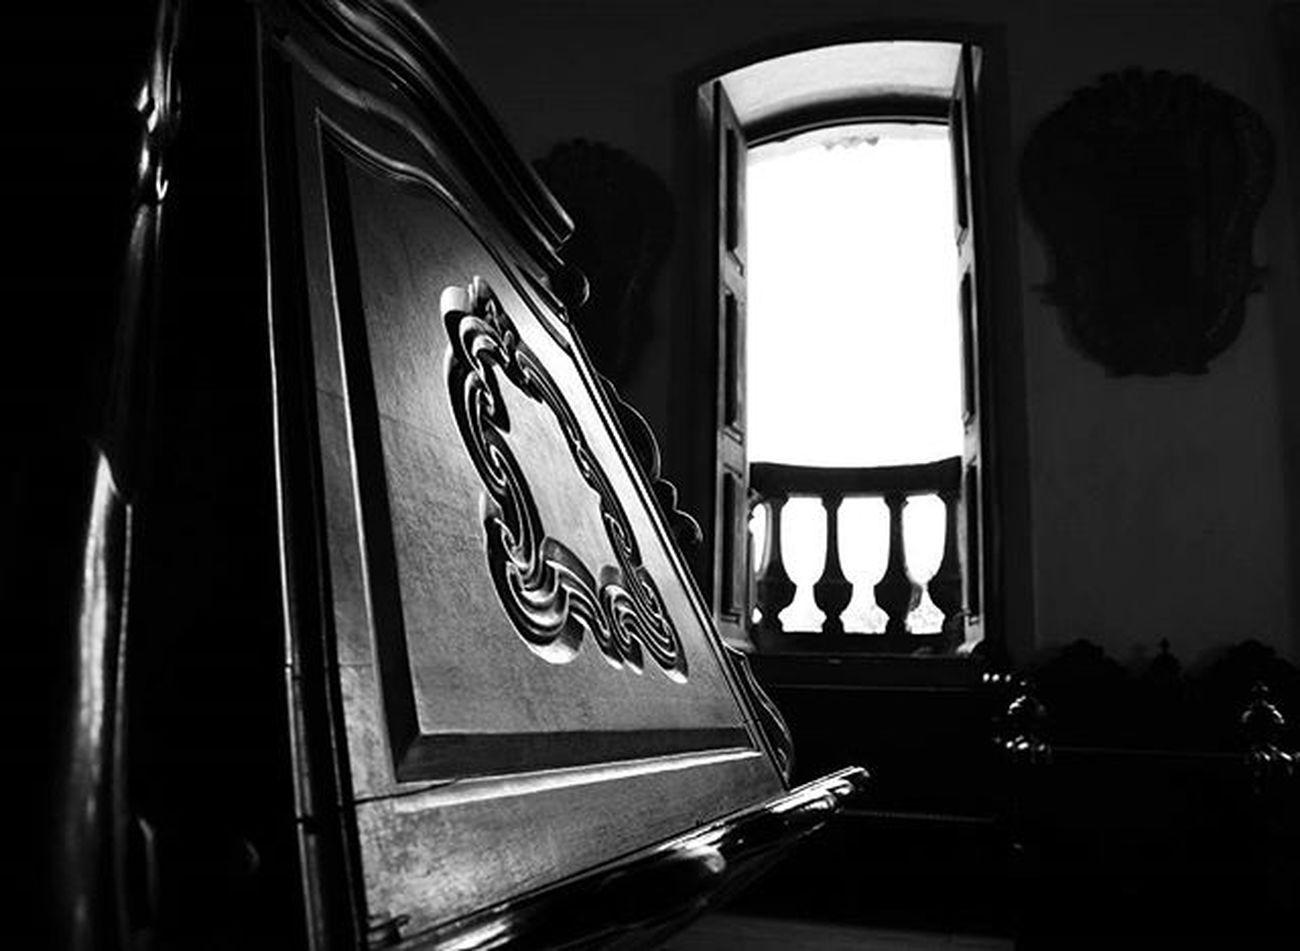 Photo Photographer Photograph Foto Fotografia Instagood Instafoto Instalike Instaphoto Instaphotography Light Luz Sombra Shadow Picture Portrait Instaportrait Igrejasaofrancisco Joaopessoa Paraíba Brazil Barroco Blackandwhite Instablackandwhite Pretoebranco